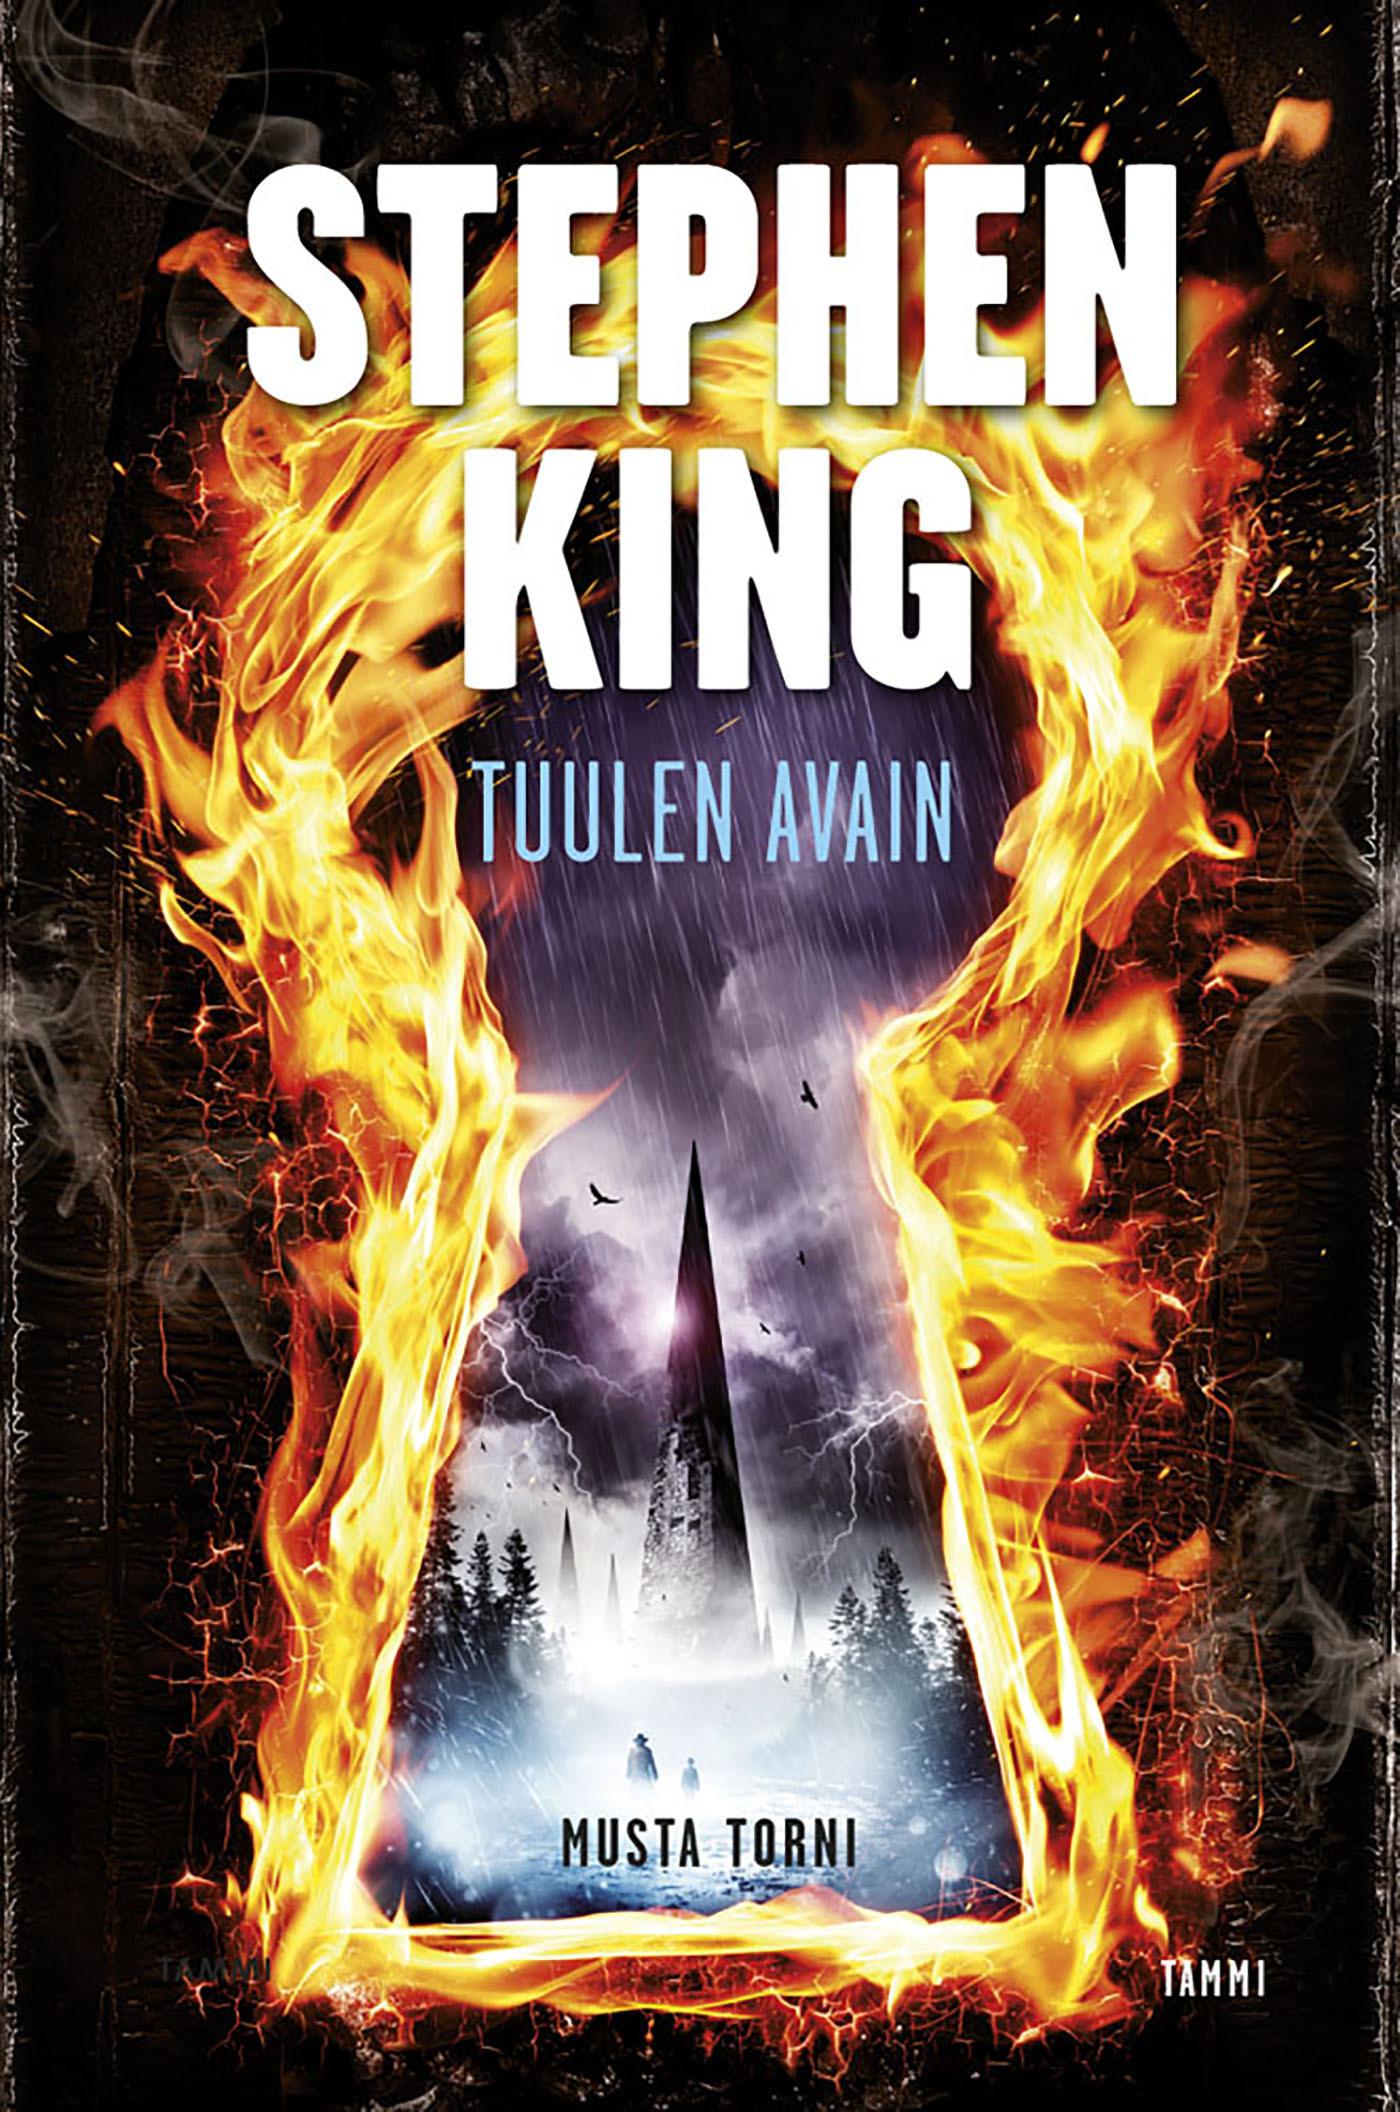 King, Stephen - Tuulen avain, ebook